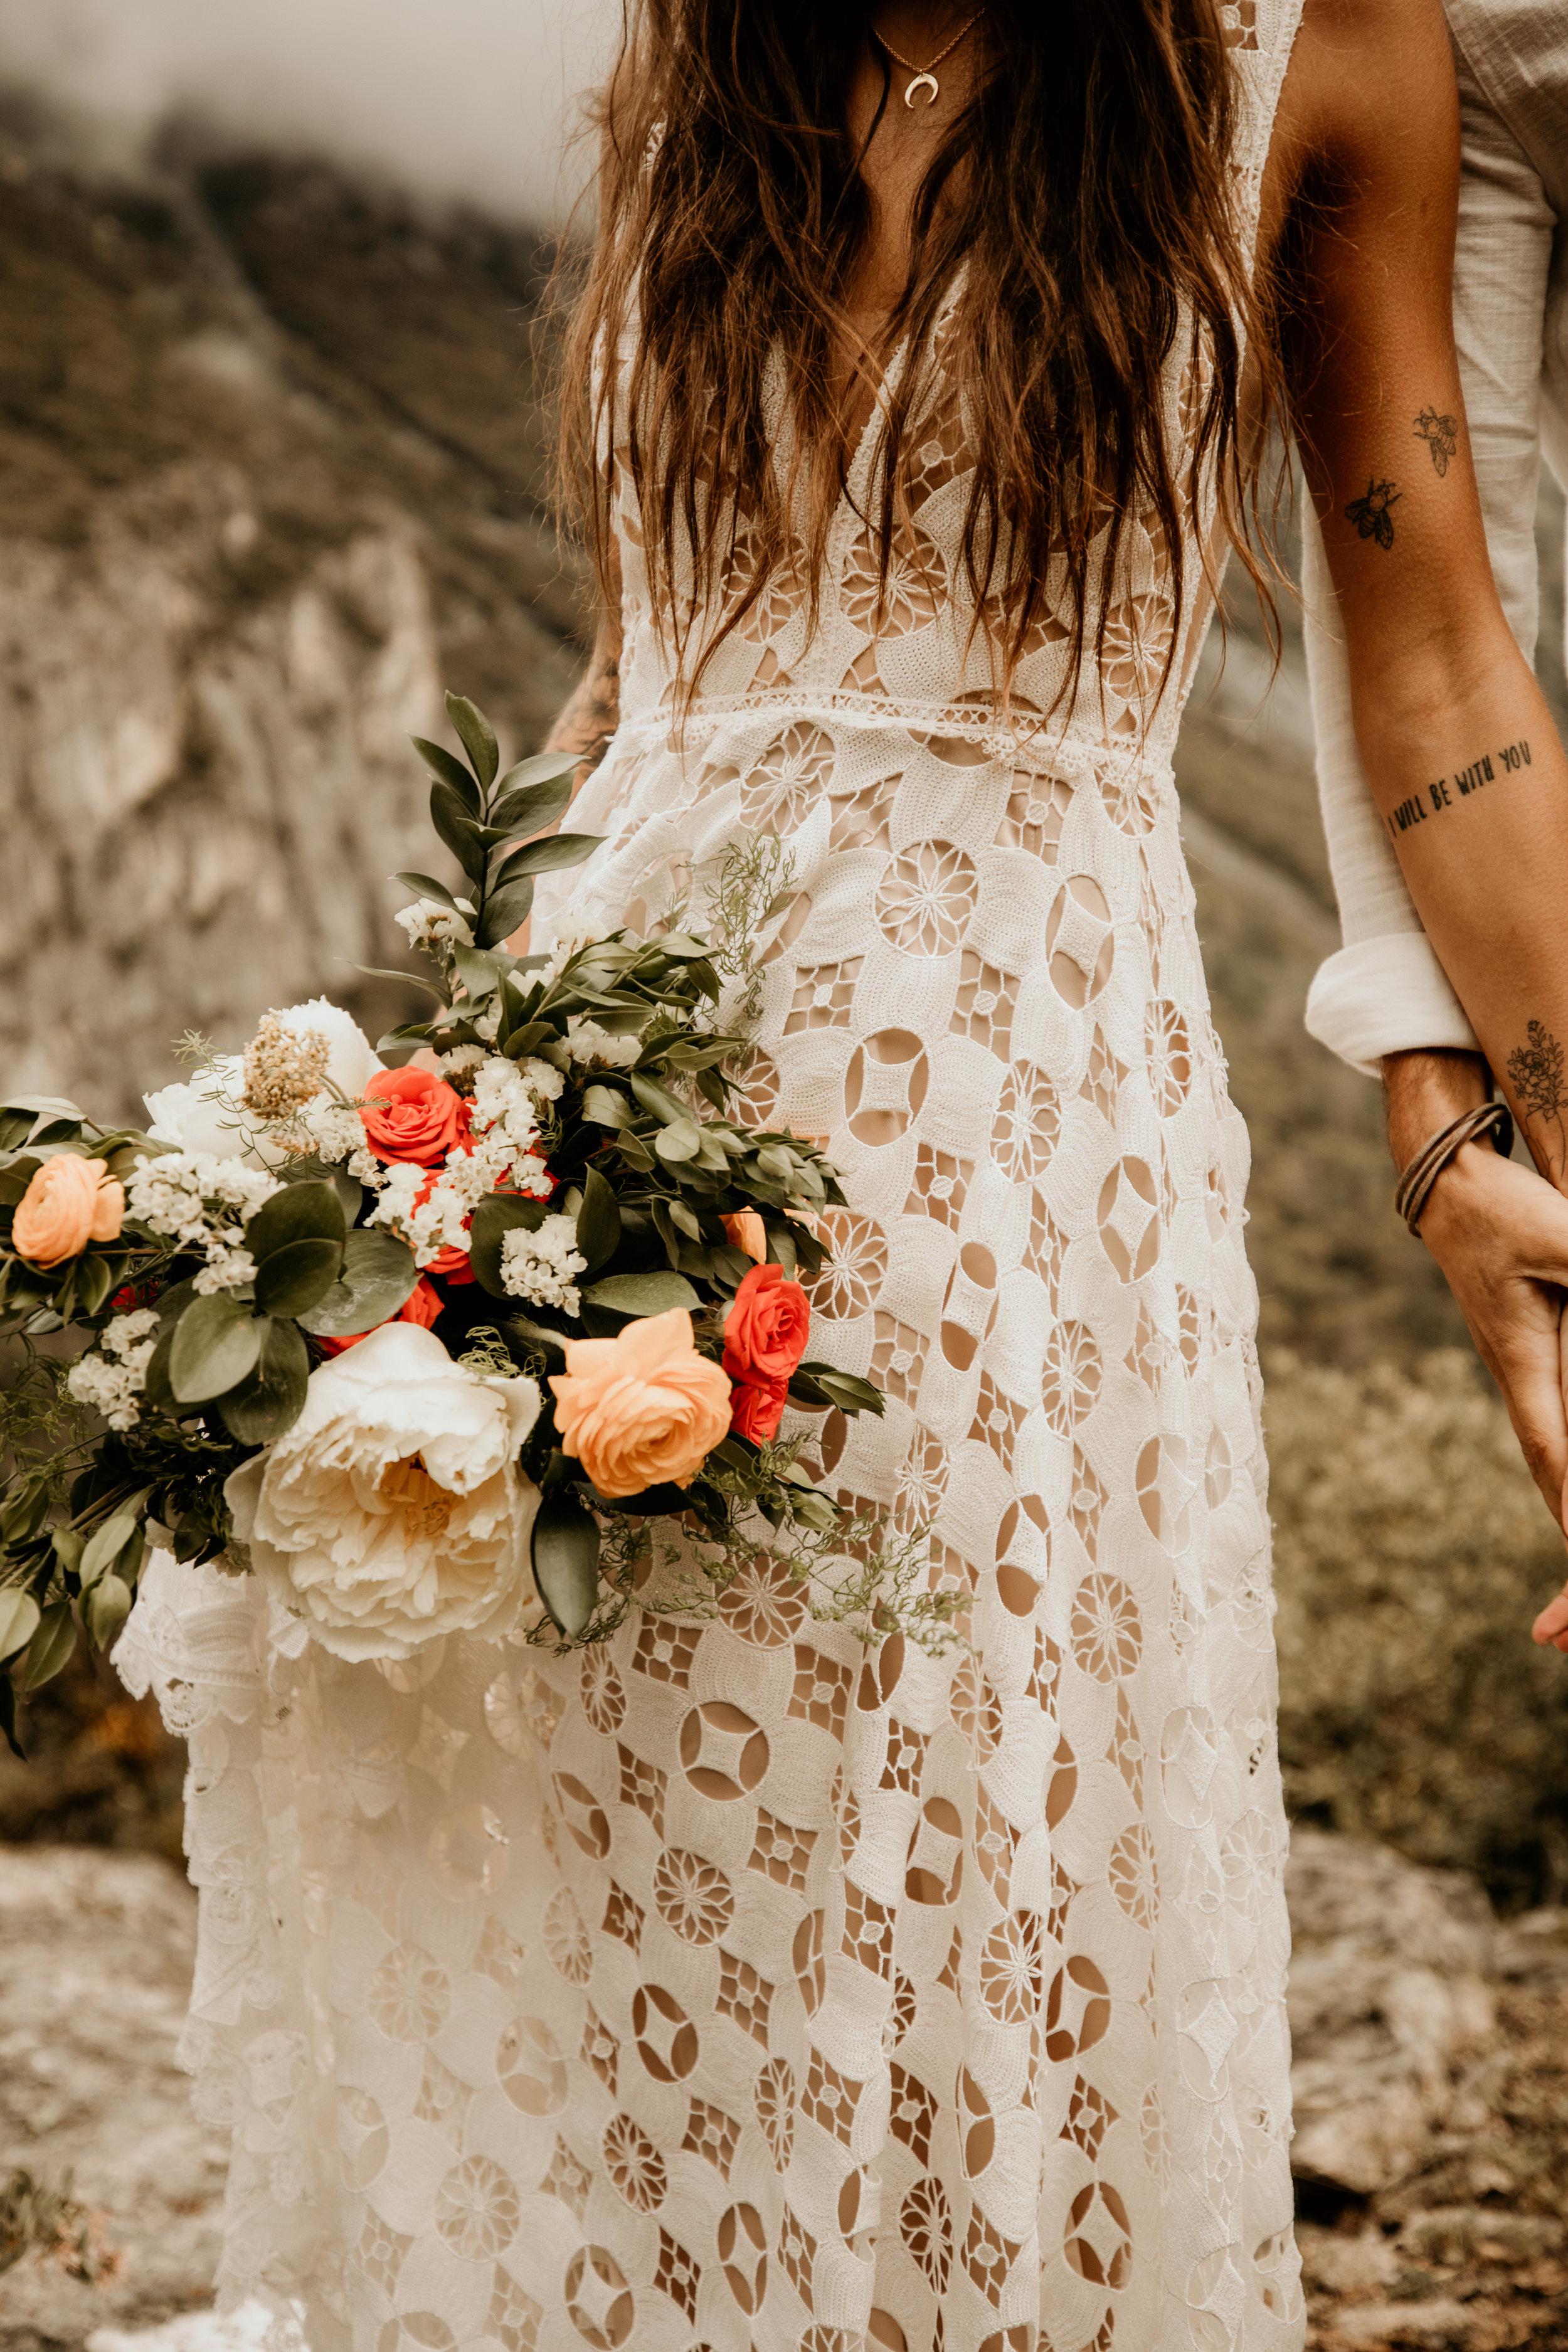 couples-engagement-outdoor-tatoo-photoshoot-little-rock-arkansas-4263.jpg